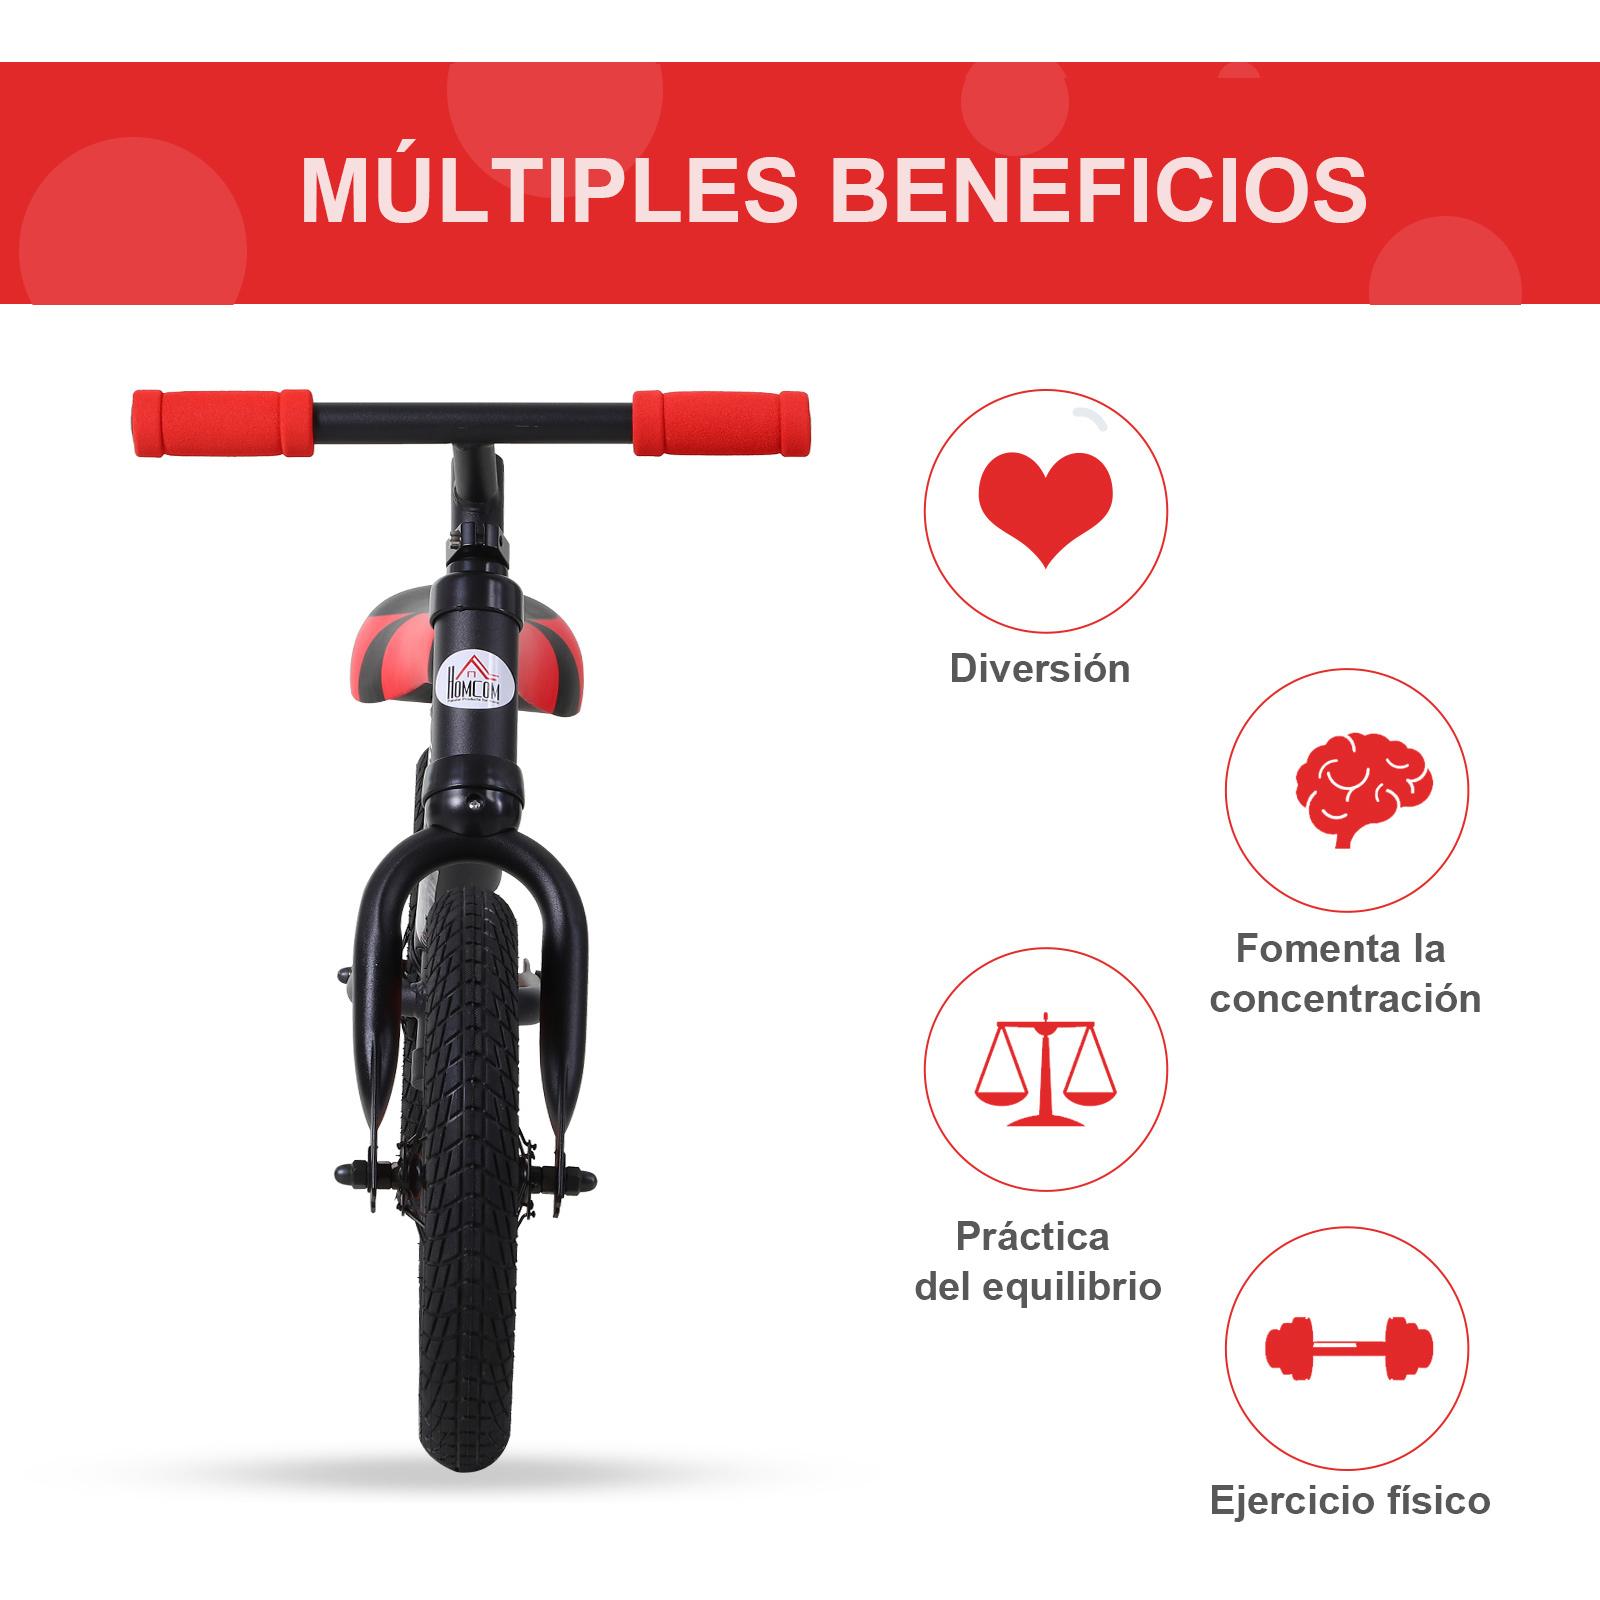 Bicicleta-sin-Pedales-de-Altura-de-Asiento-Regulable-31-45cm-2-5-Anos miniatura 7